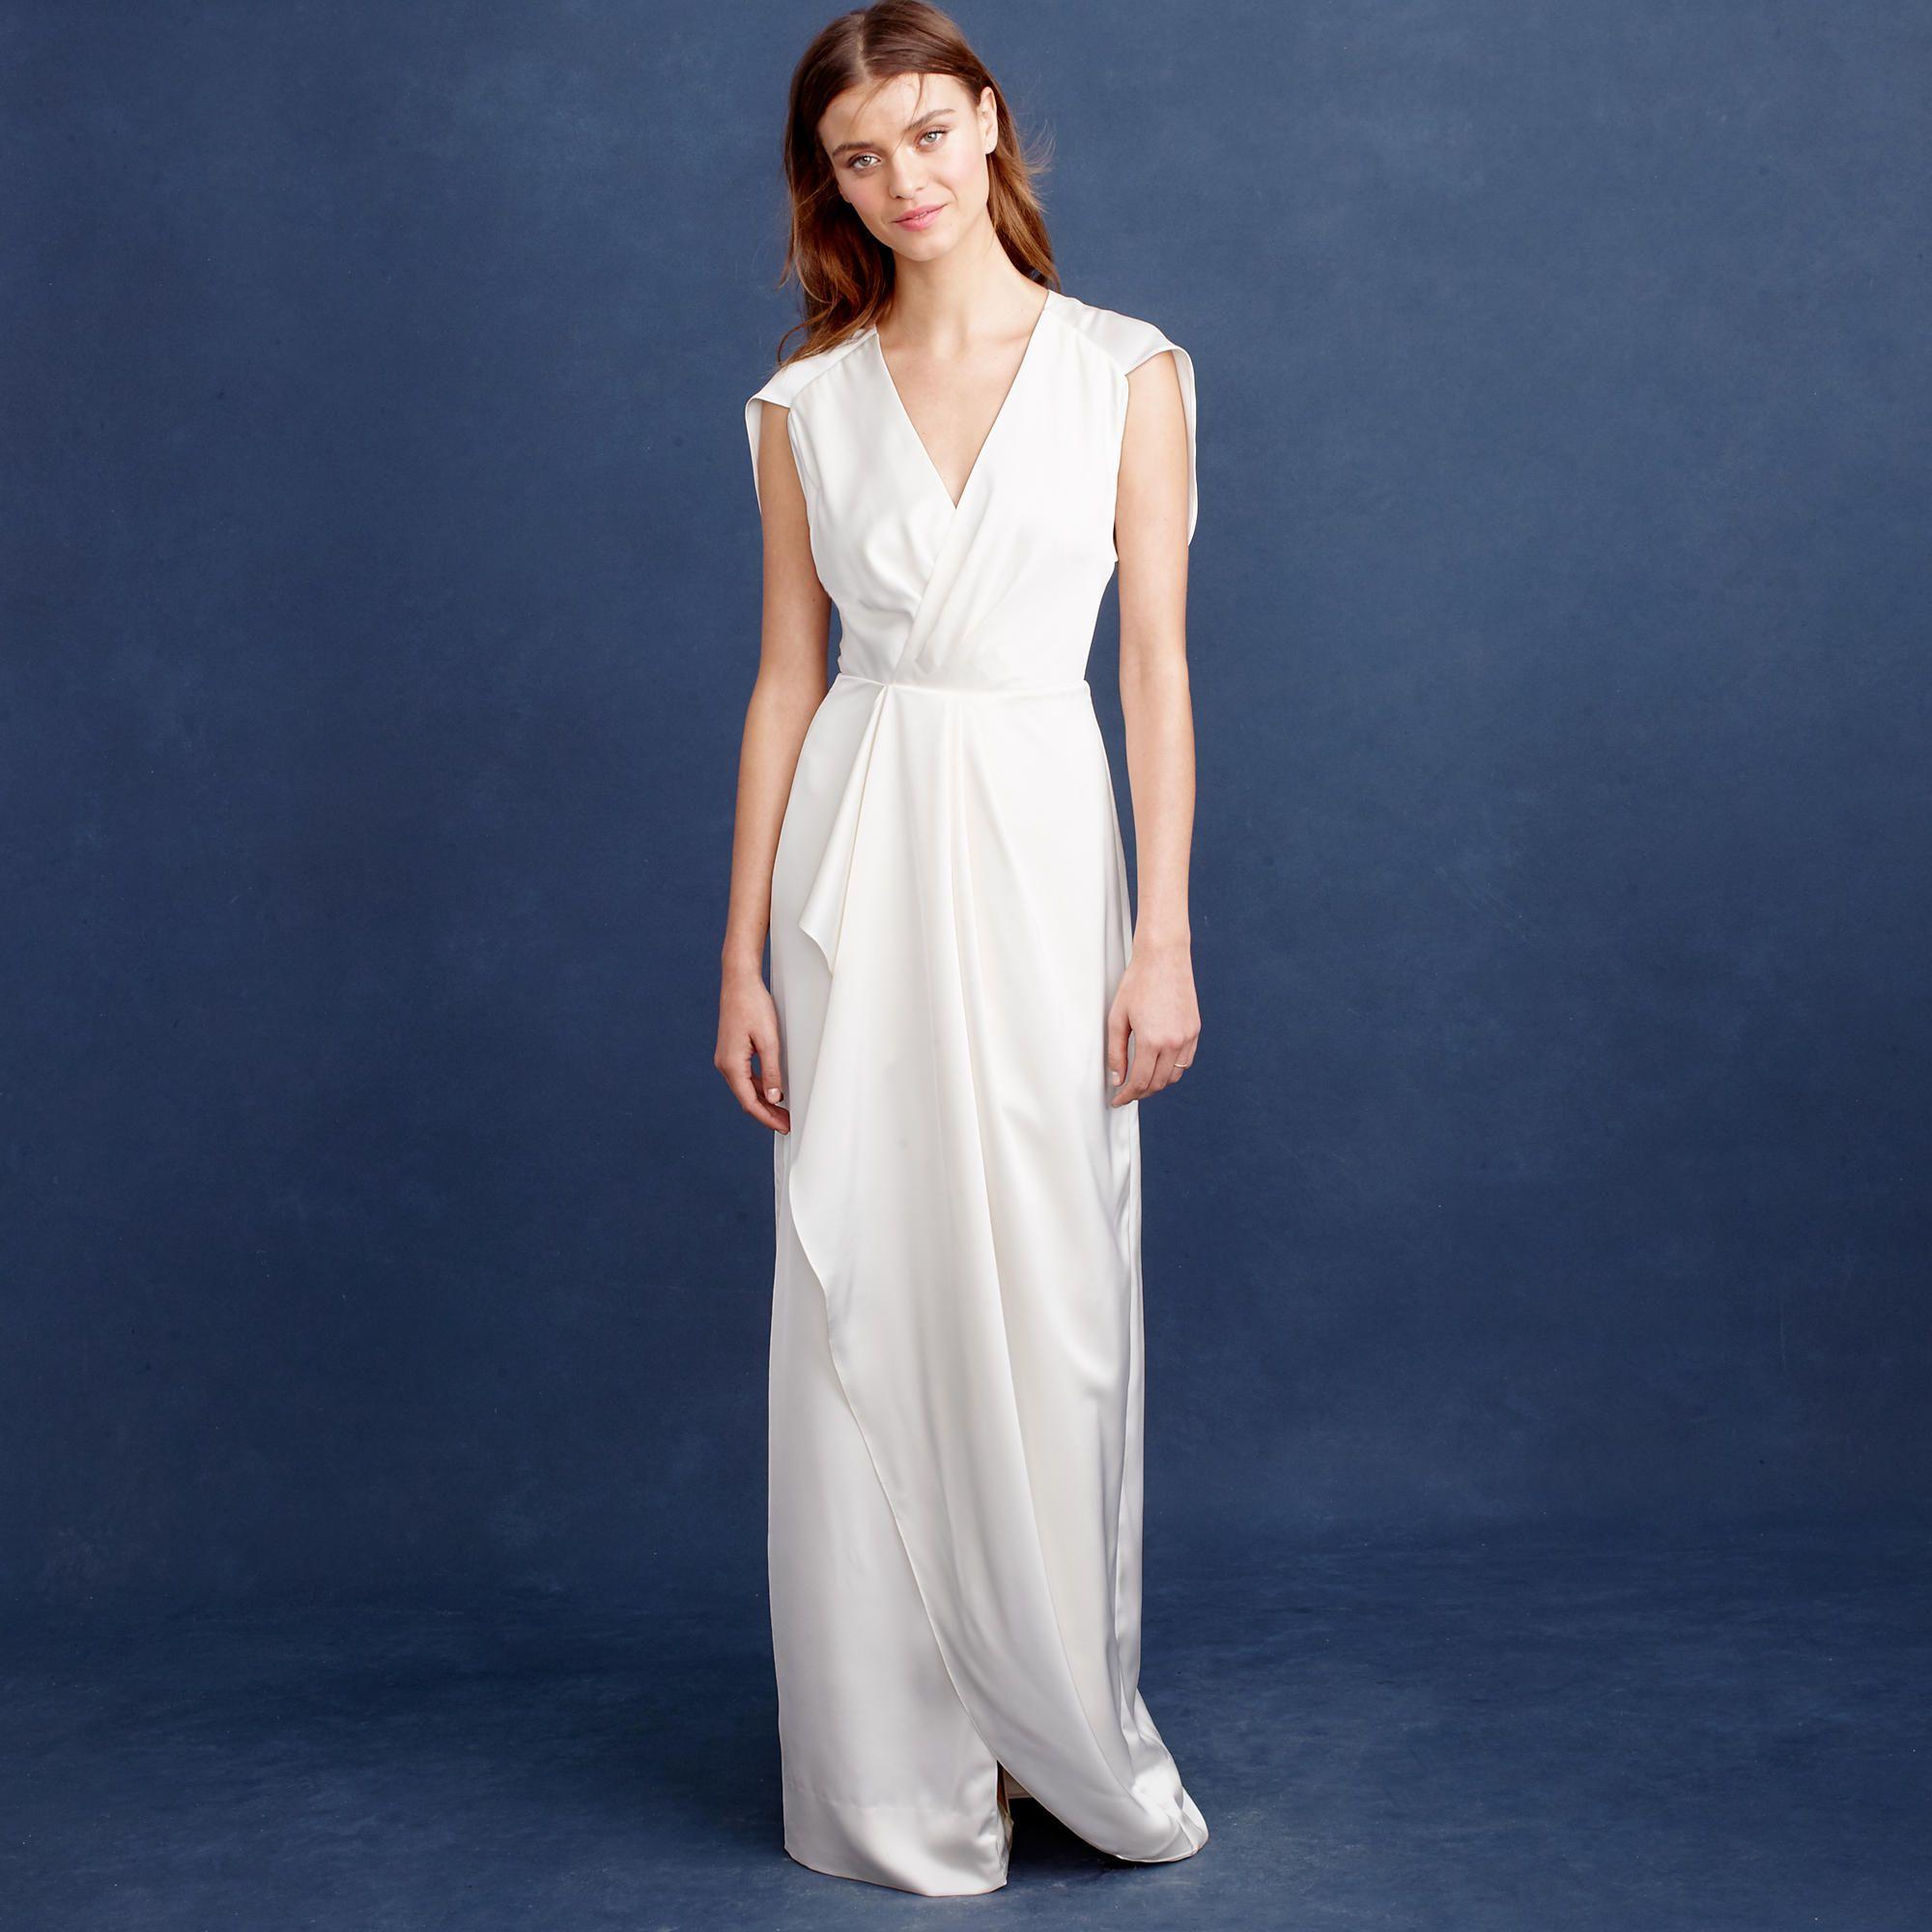 25 Beachy Wedding Dresses for Your Seaside IDos'